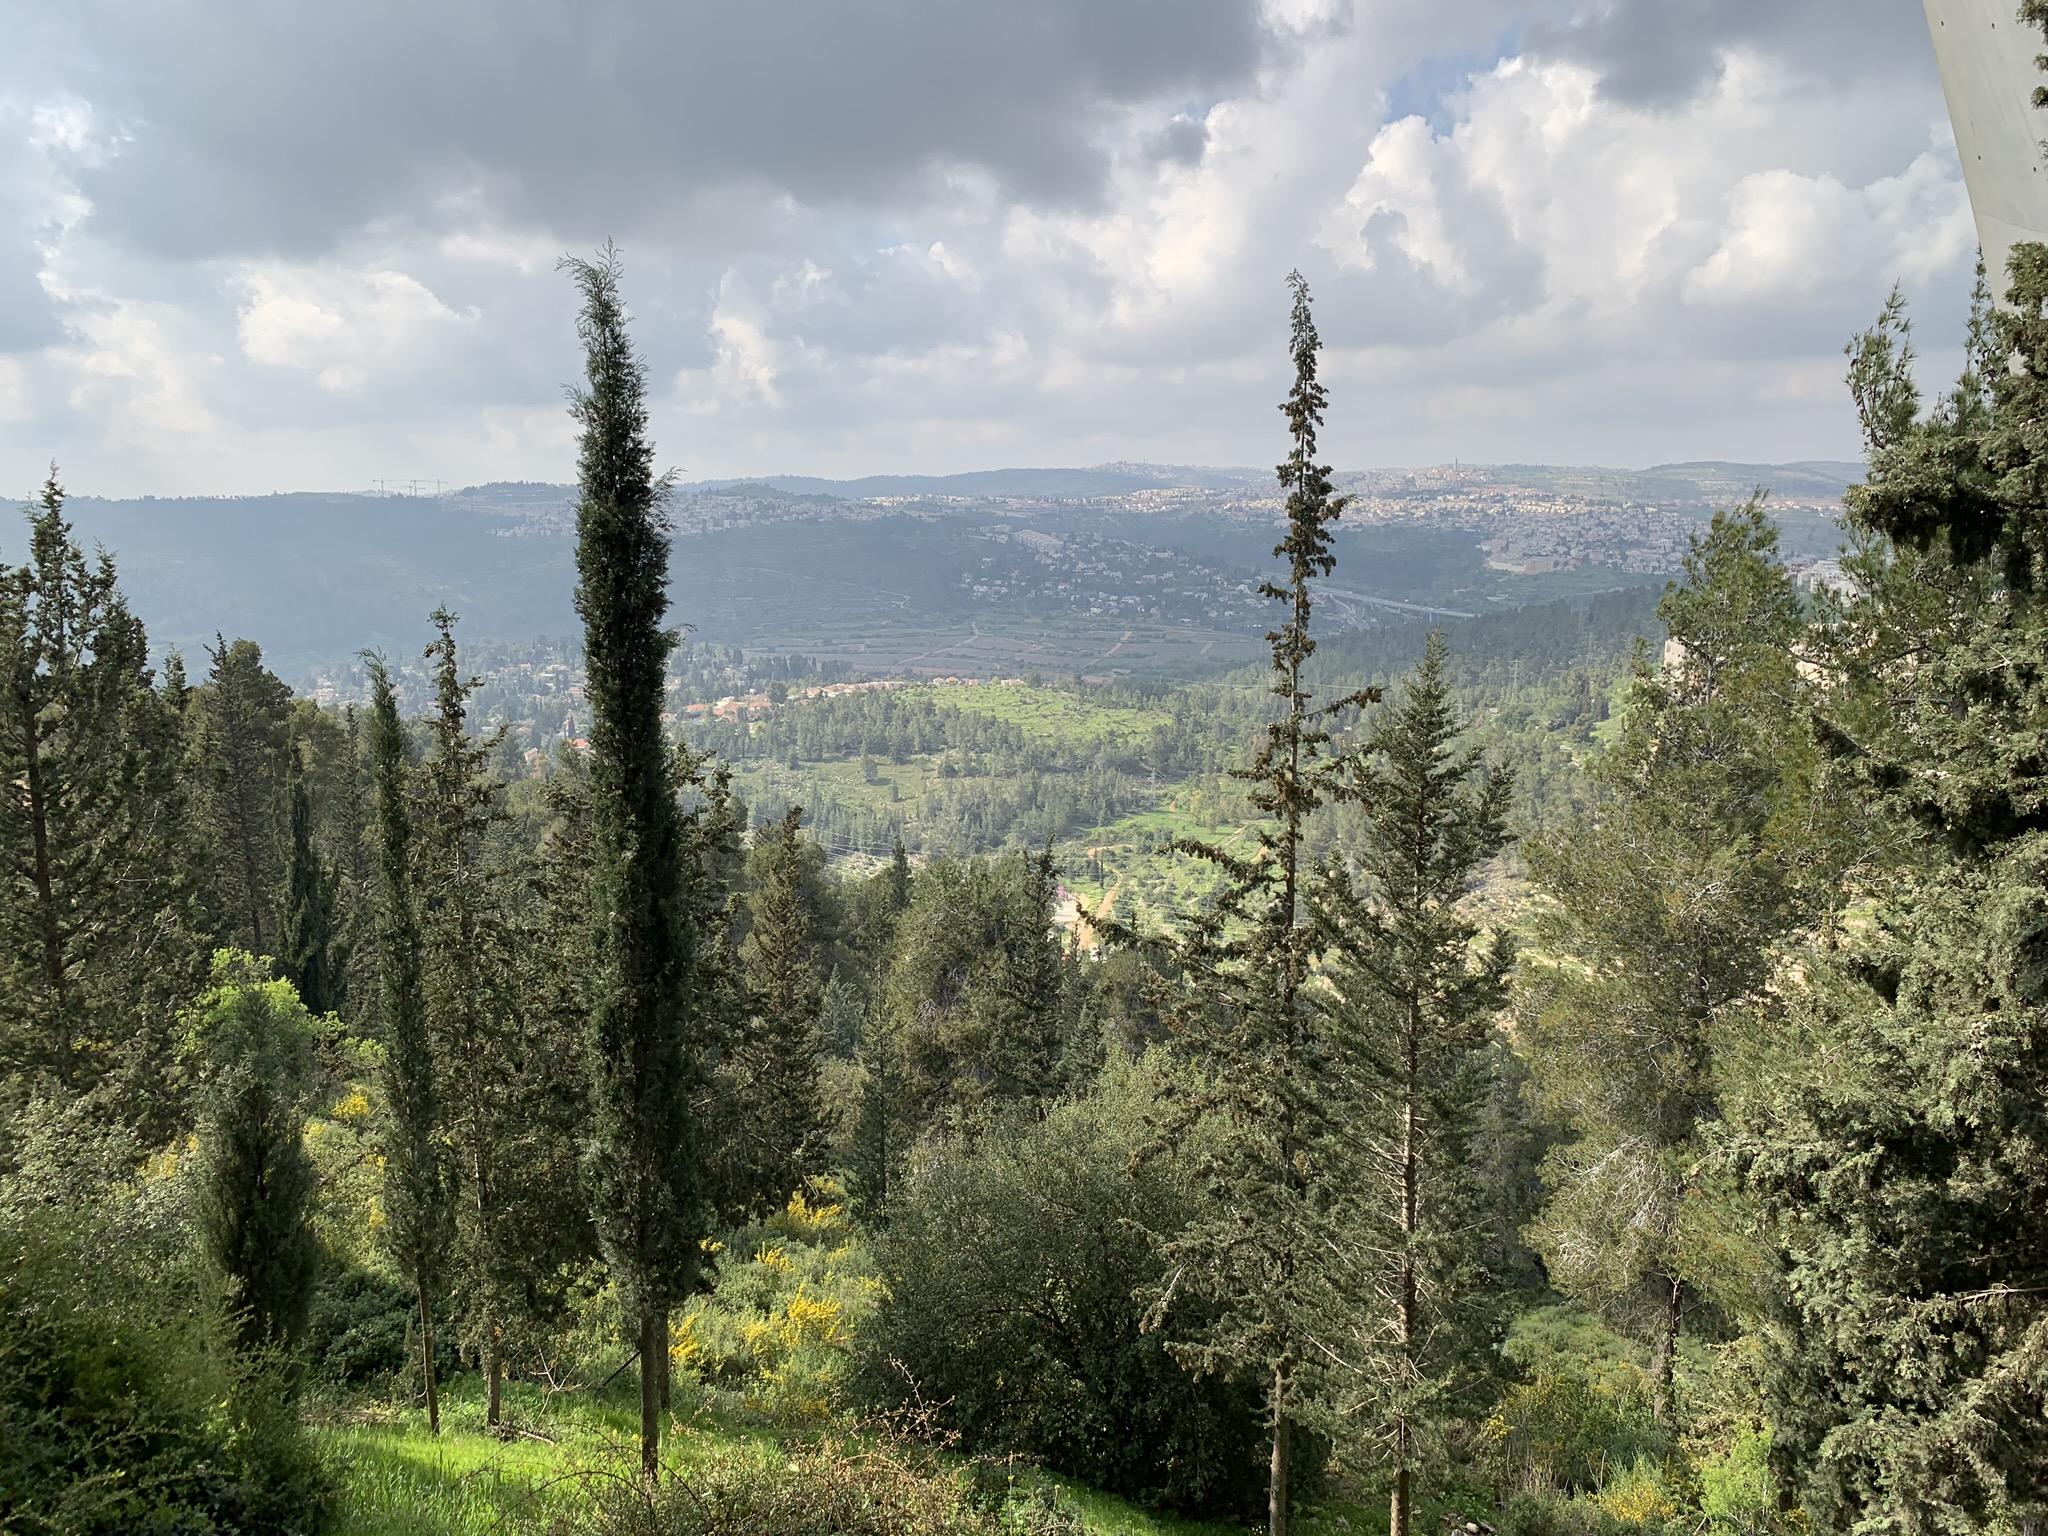 Yad Vashem view today